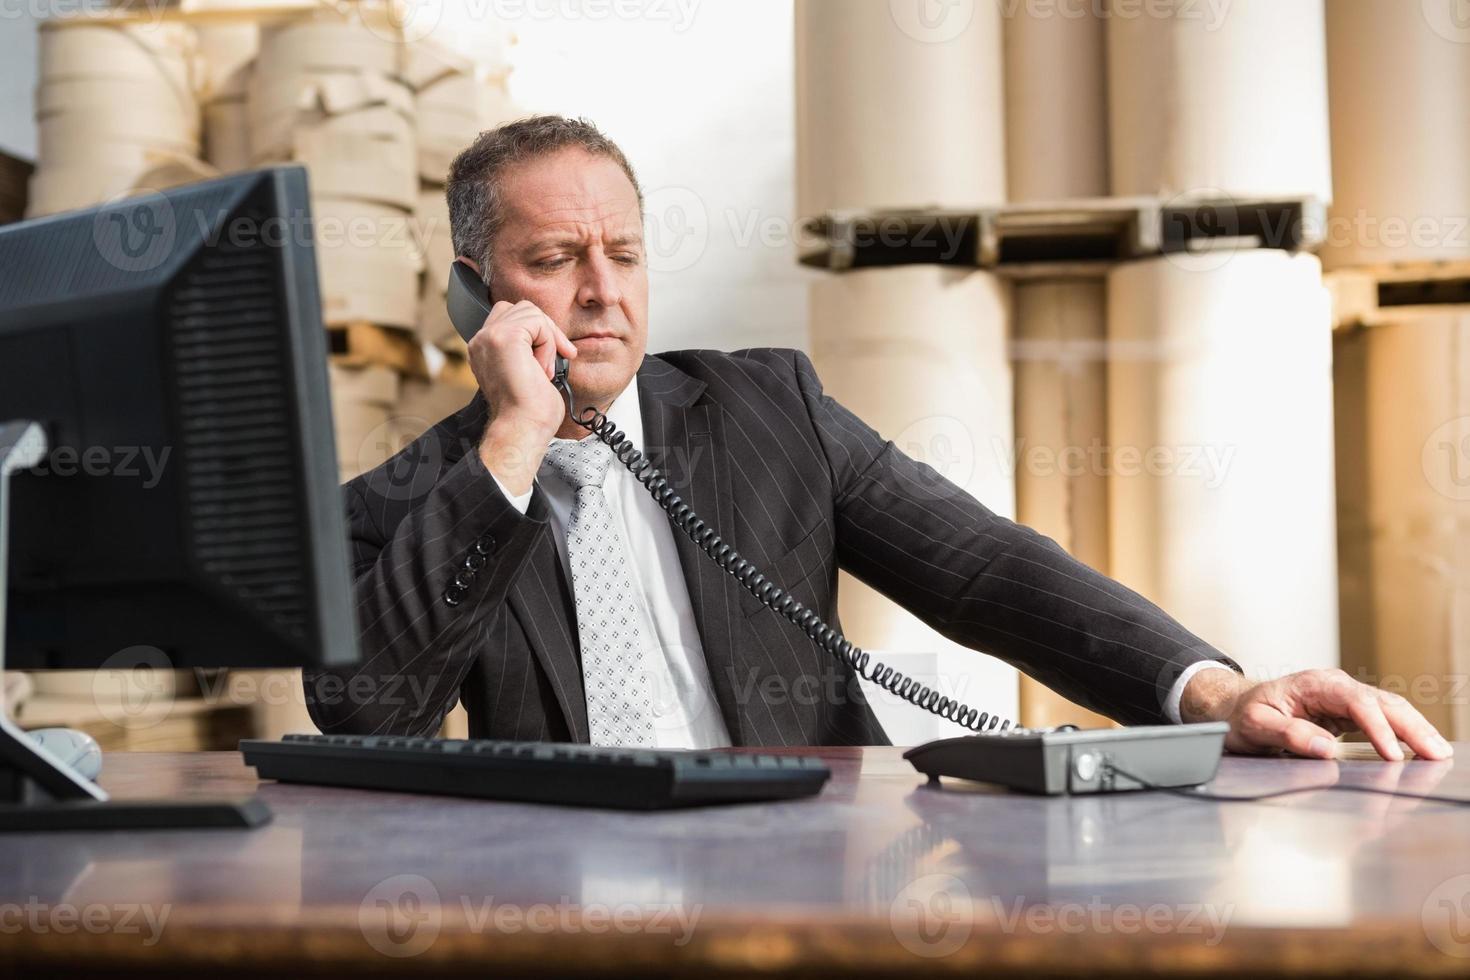 Warehouse manager using telephone and laptop photo